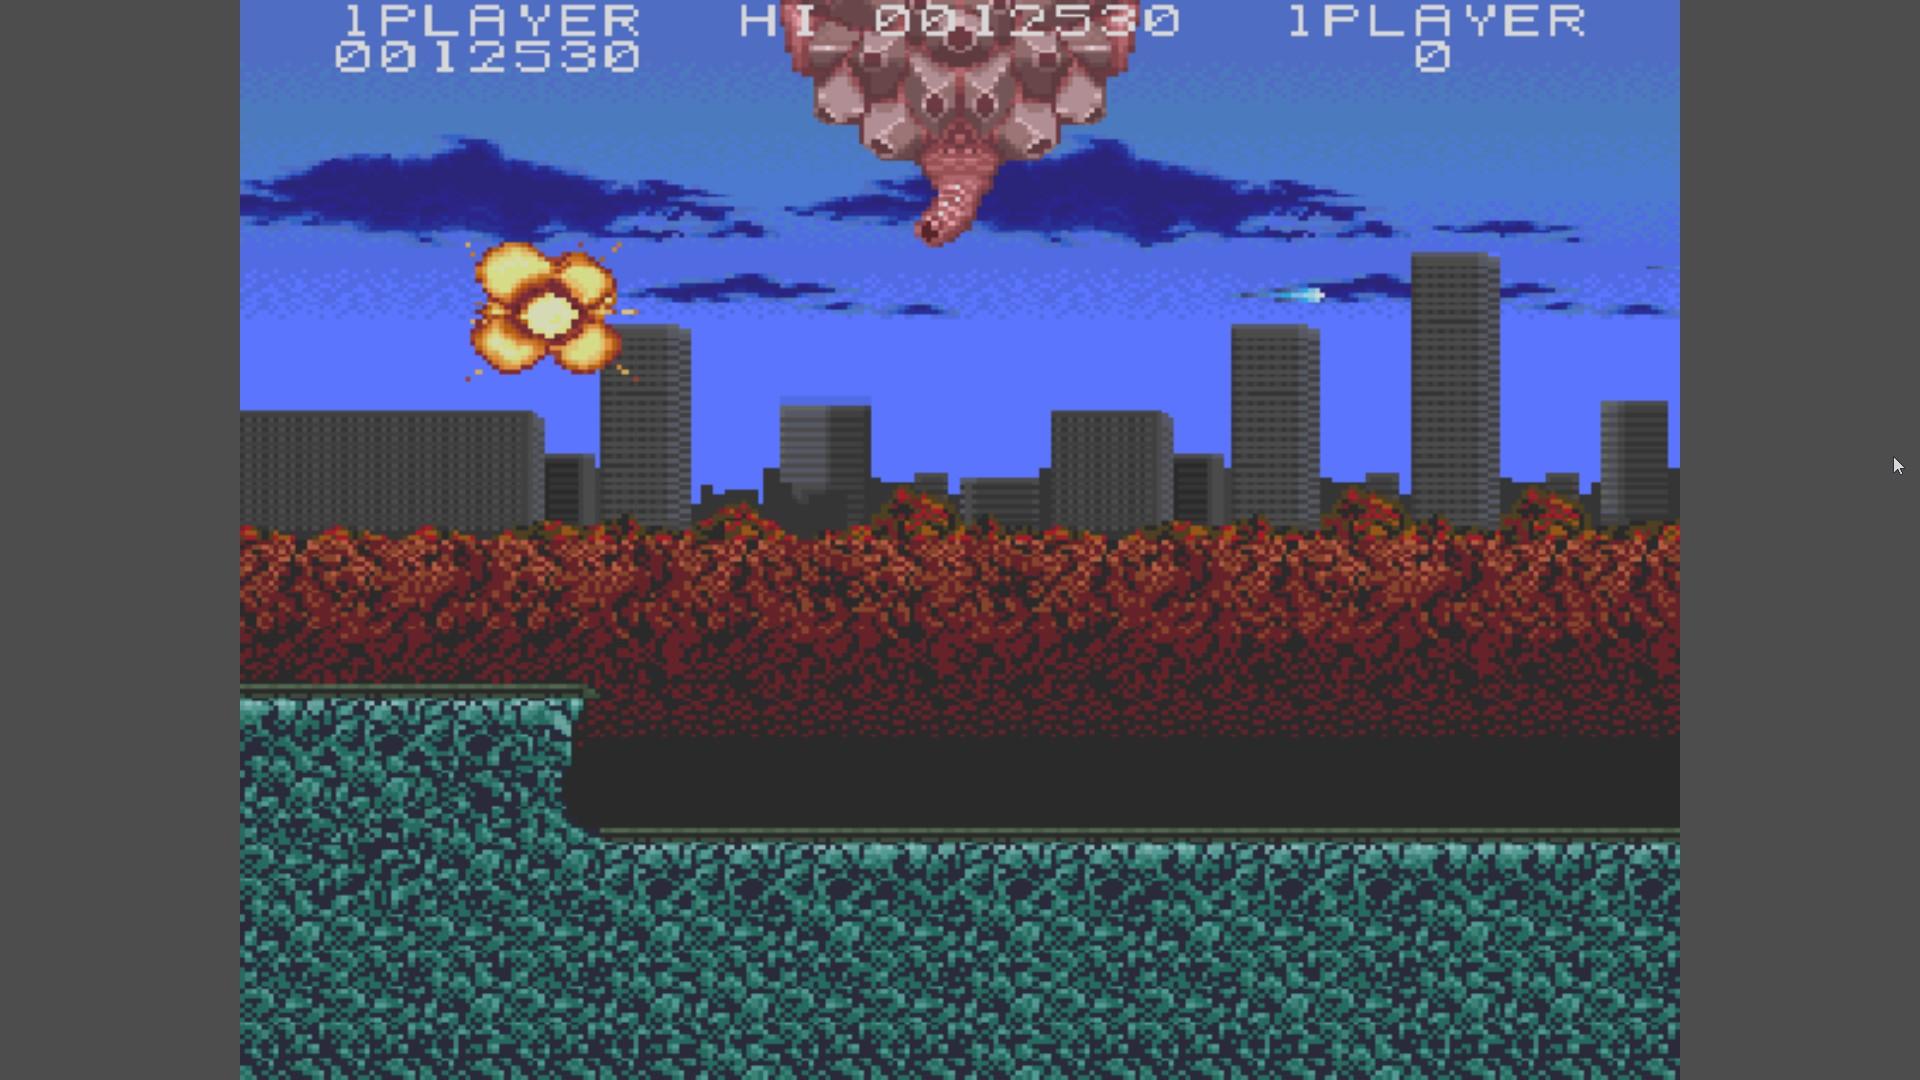 AkinNahtanoj: Act-Fancer Cybernetick Hyper Weapon [actfancr] (Arcade Emulated / M.A.M.E.) 12,530 points on 2020-09-30 12:23:49